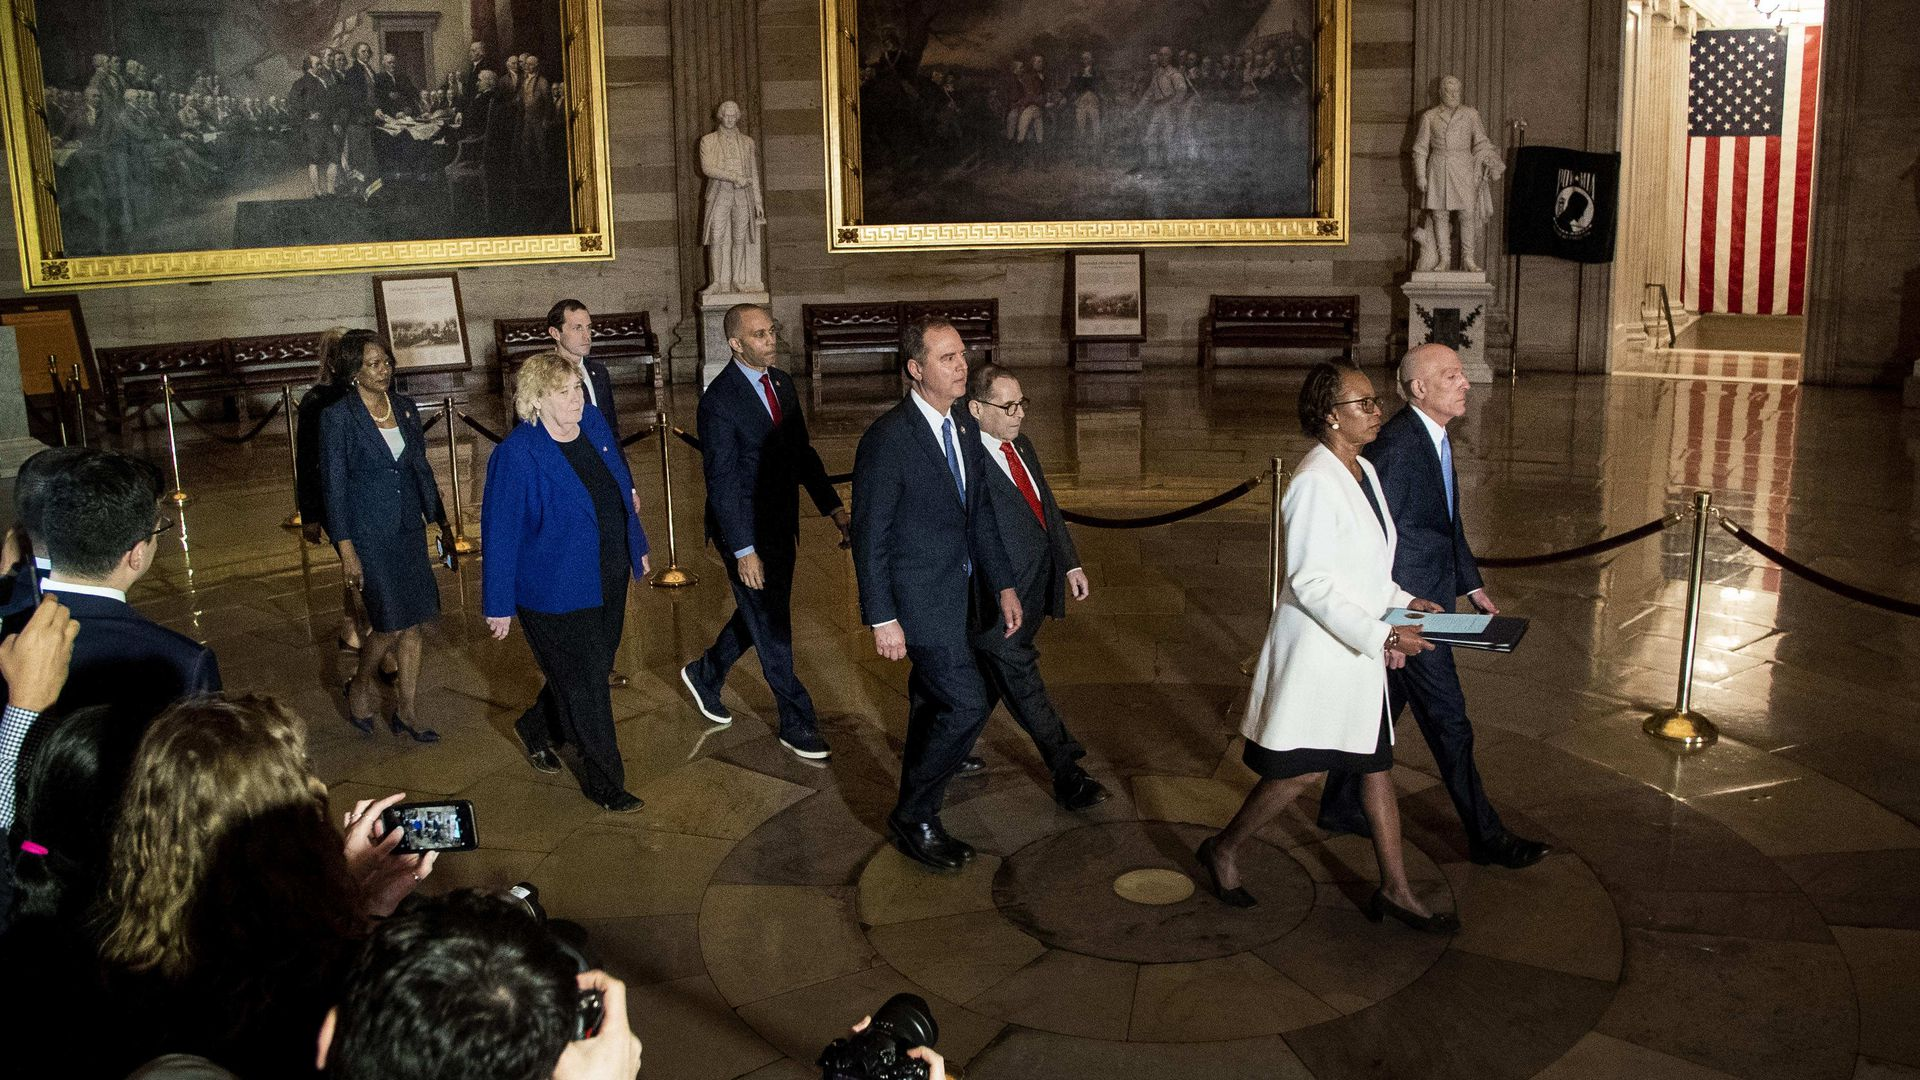 House managers walk through the Capitol Rotunda